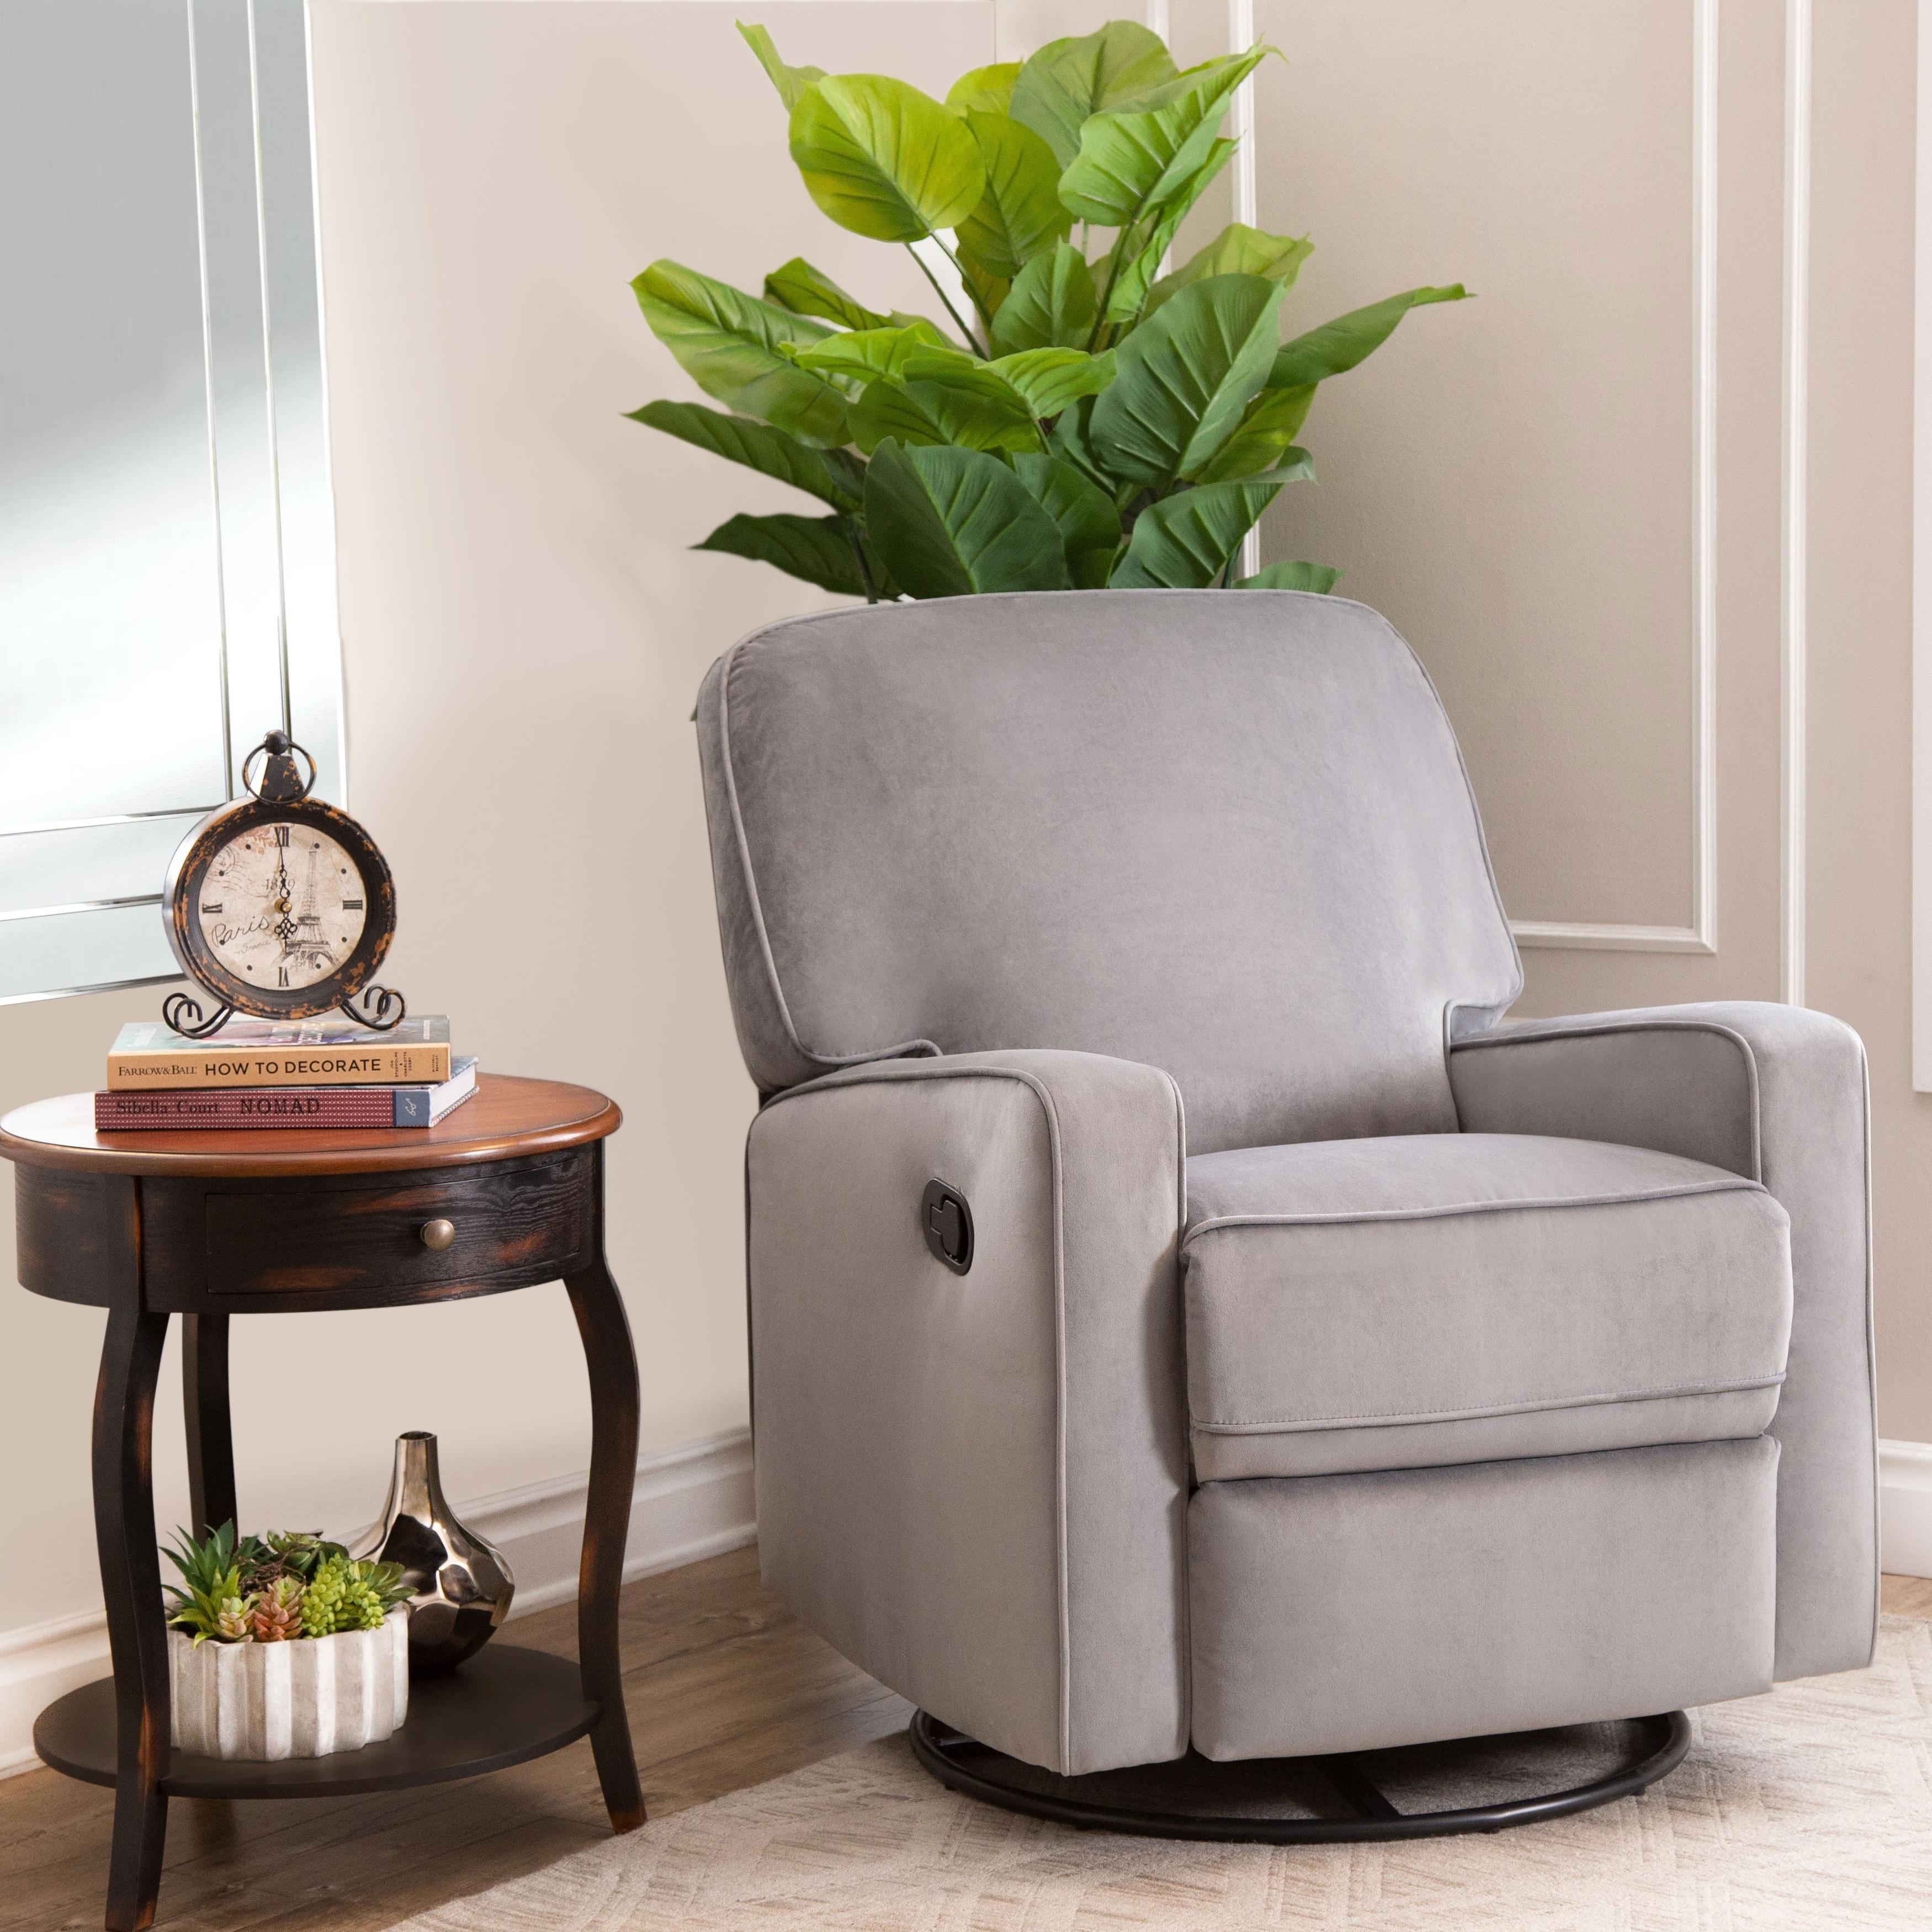 Pleasant Abbyson Bella Grey Fabric Swivel Glider Recliner Chair Machost Co Dining Chair Design Ideas Machostcouk